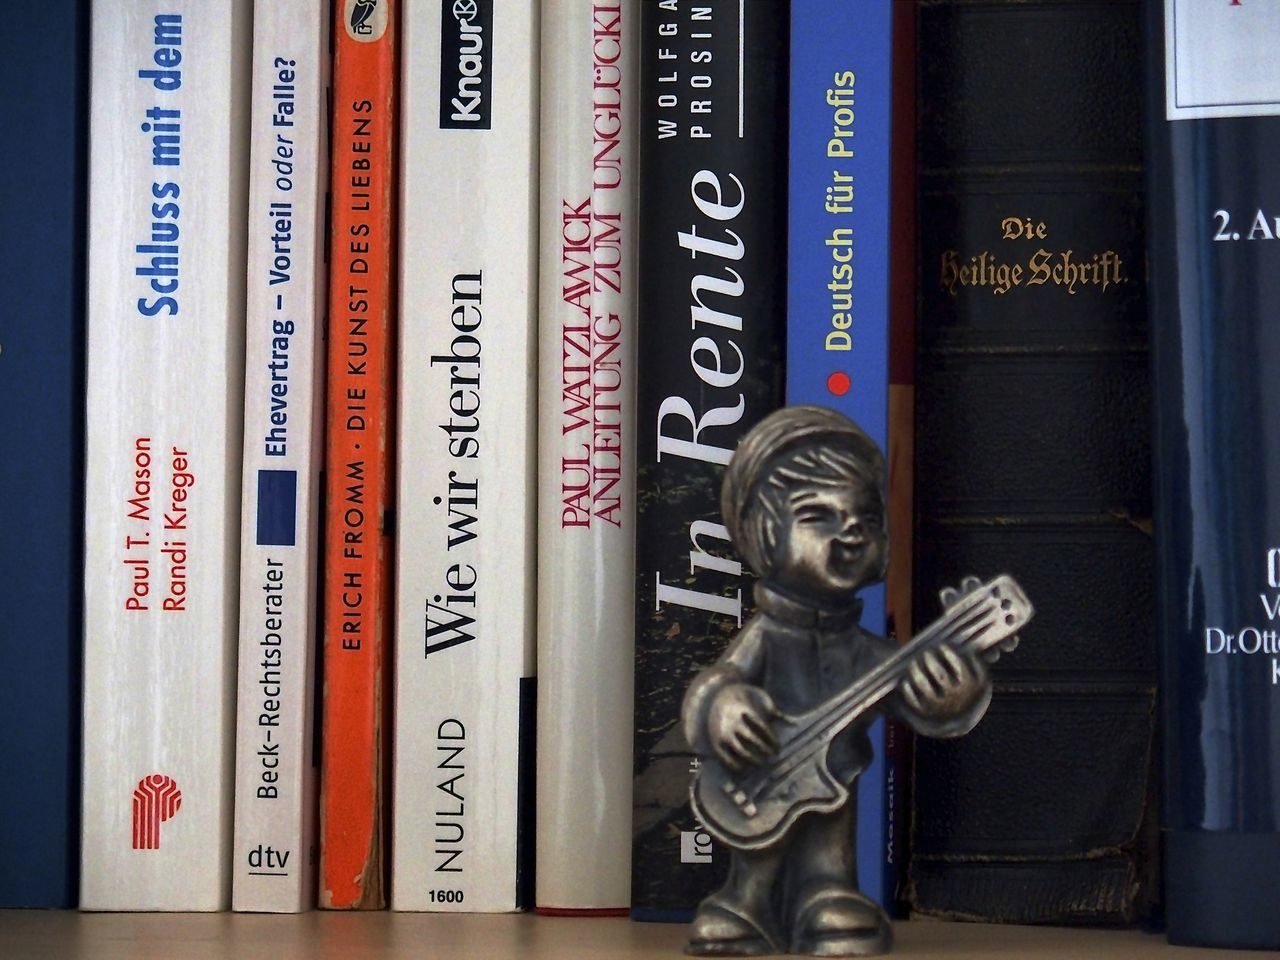 Books ♥ Bookshelf Bücher  Bücherregal Pensioner Pensioners Life Rentner Rentnerlifestyle